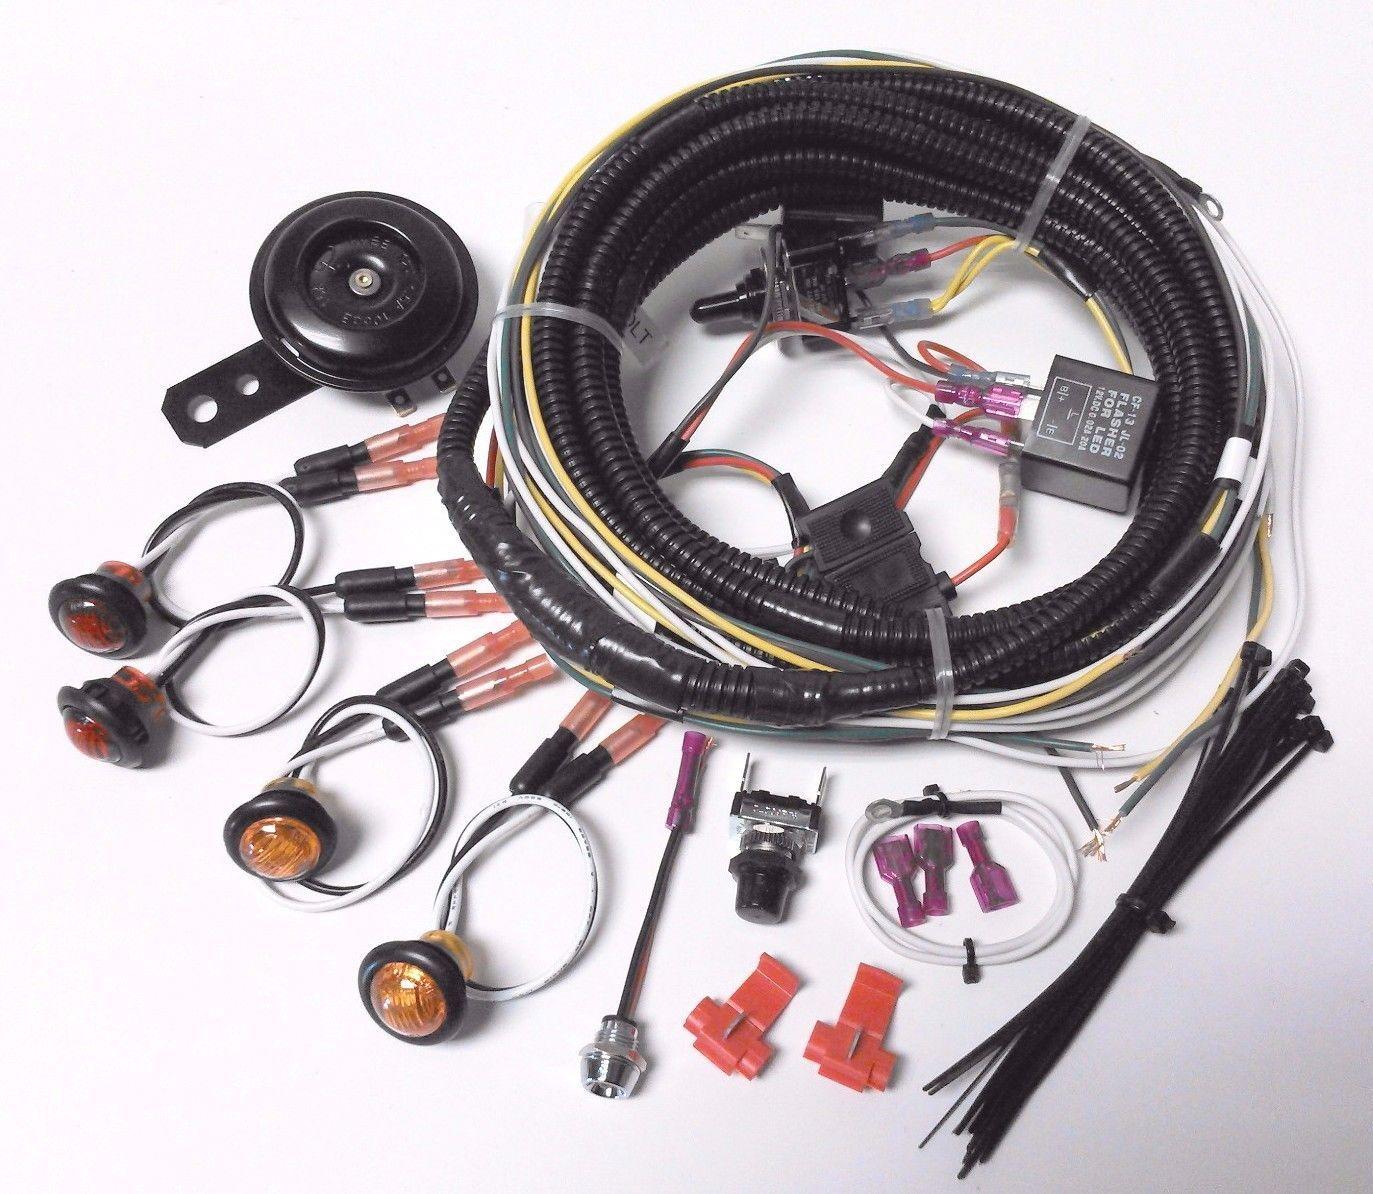 Honda Pioneer - Street Legal Turn Signal Lights Horn Kit SxS 500 700 1000 1000-4